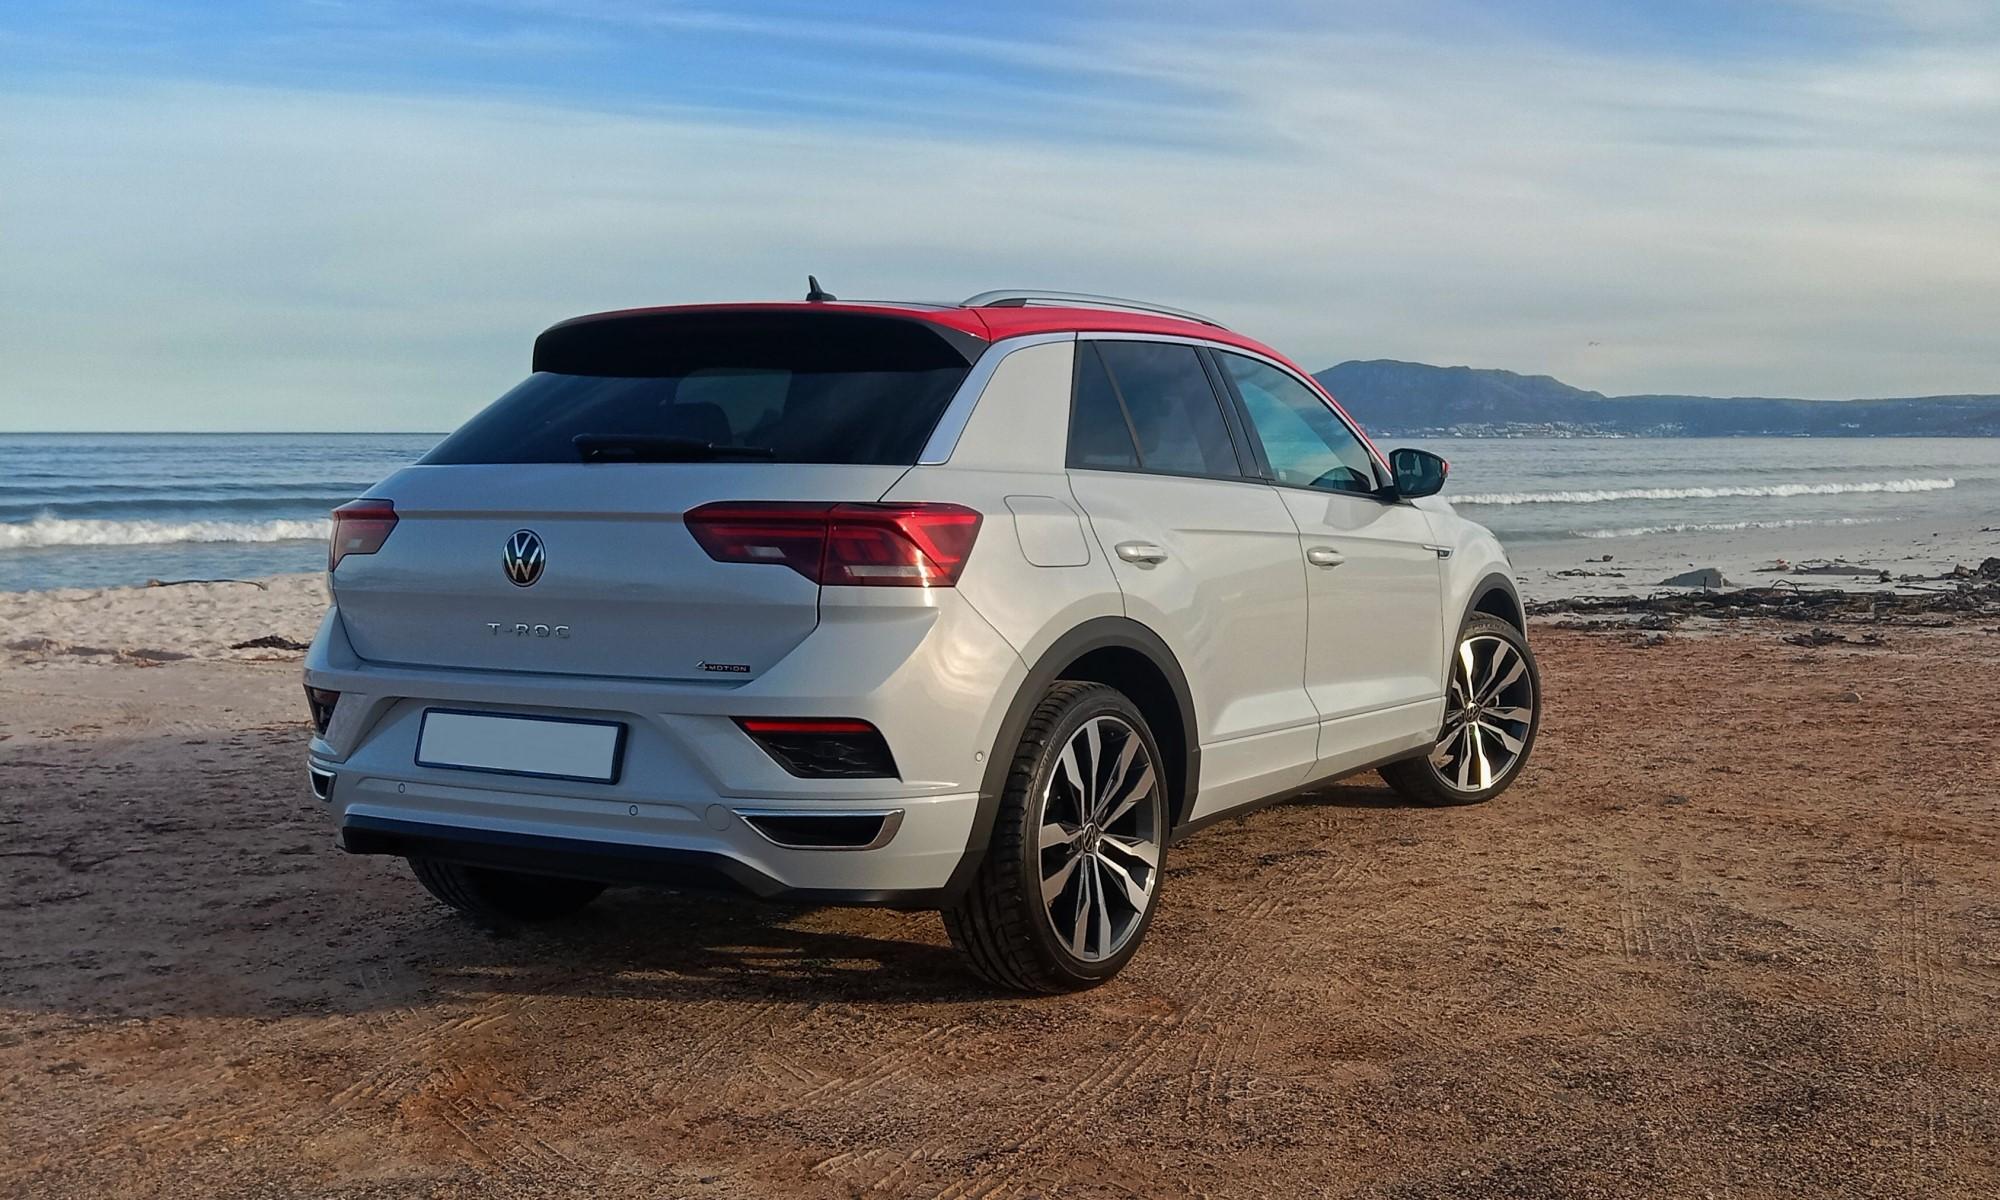 Volkswagen T-Roc 2,0 4Motion R-Line rear